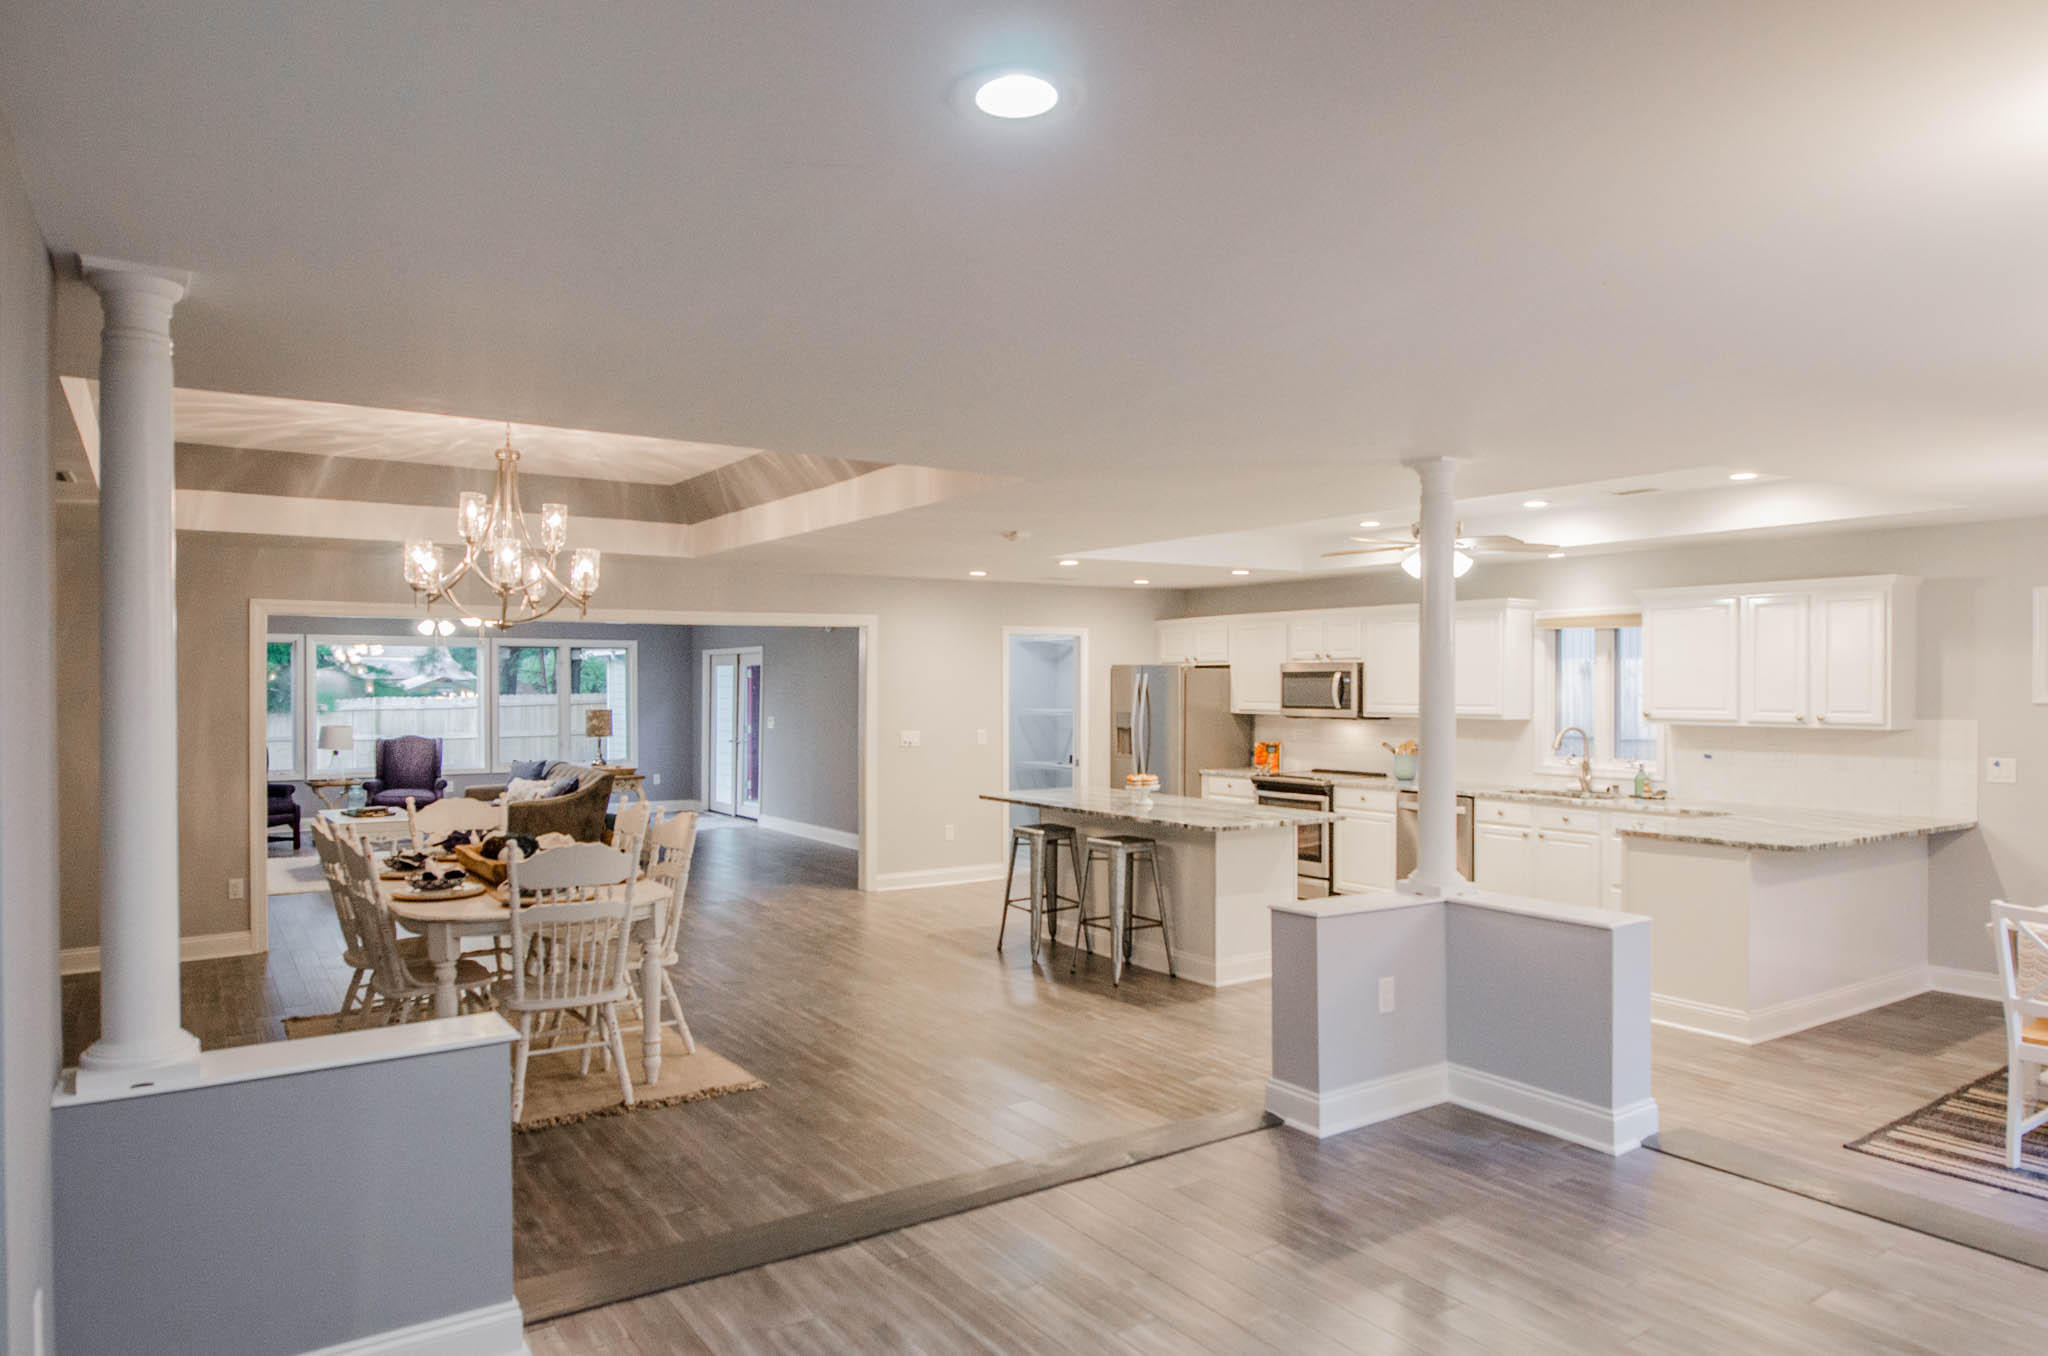 Covington Hills Homes For Sale - 5886 Ryans Bluff, North Charleston, SC - 12